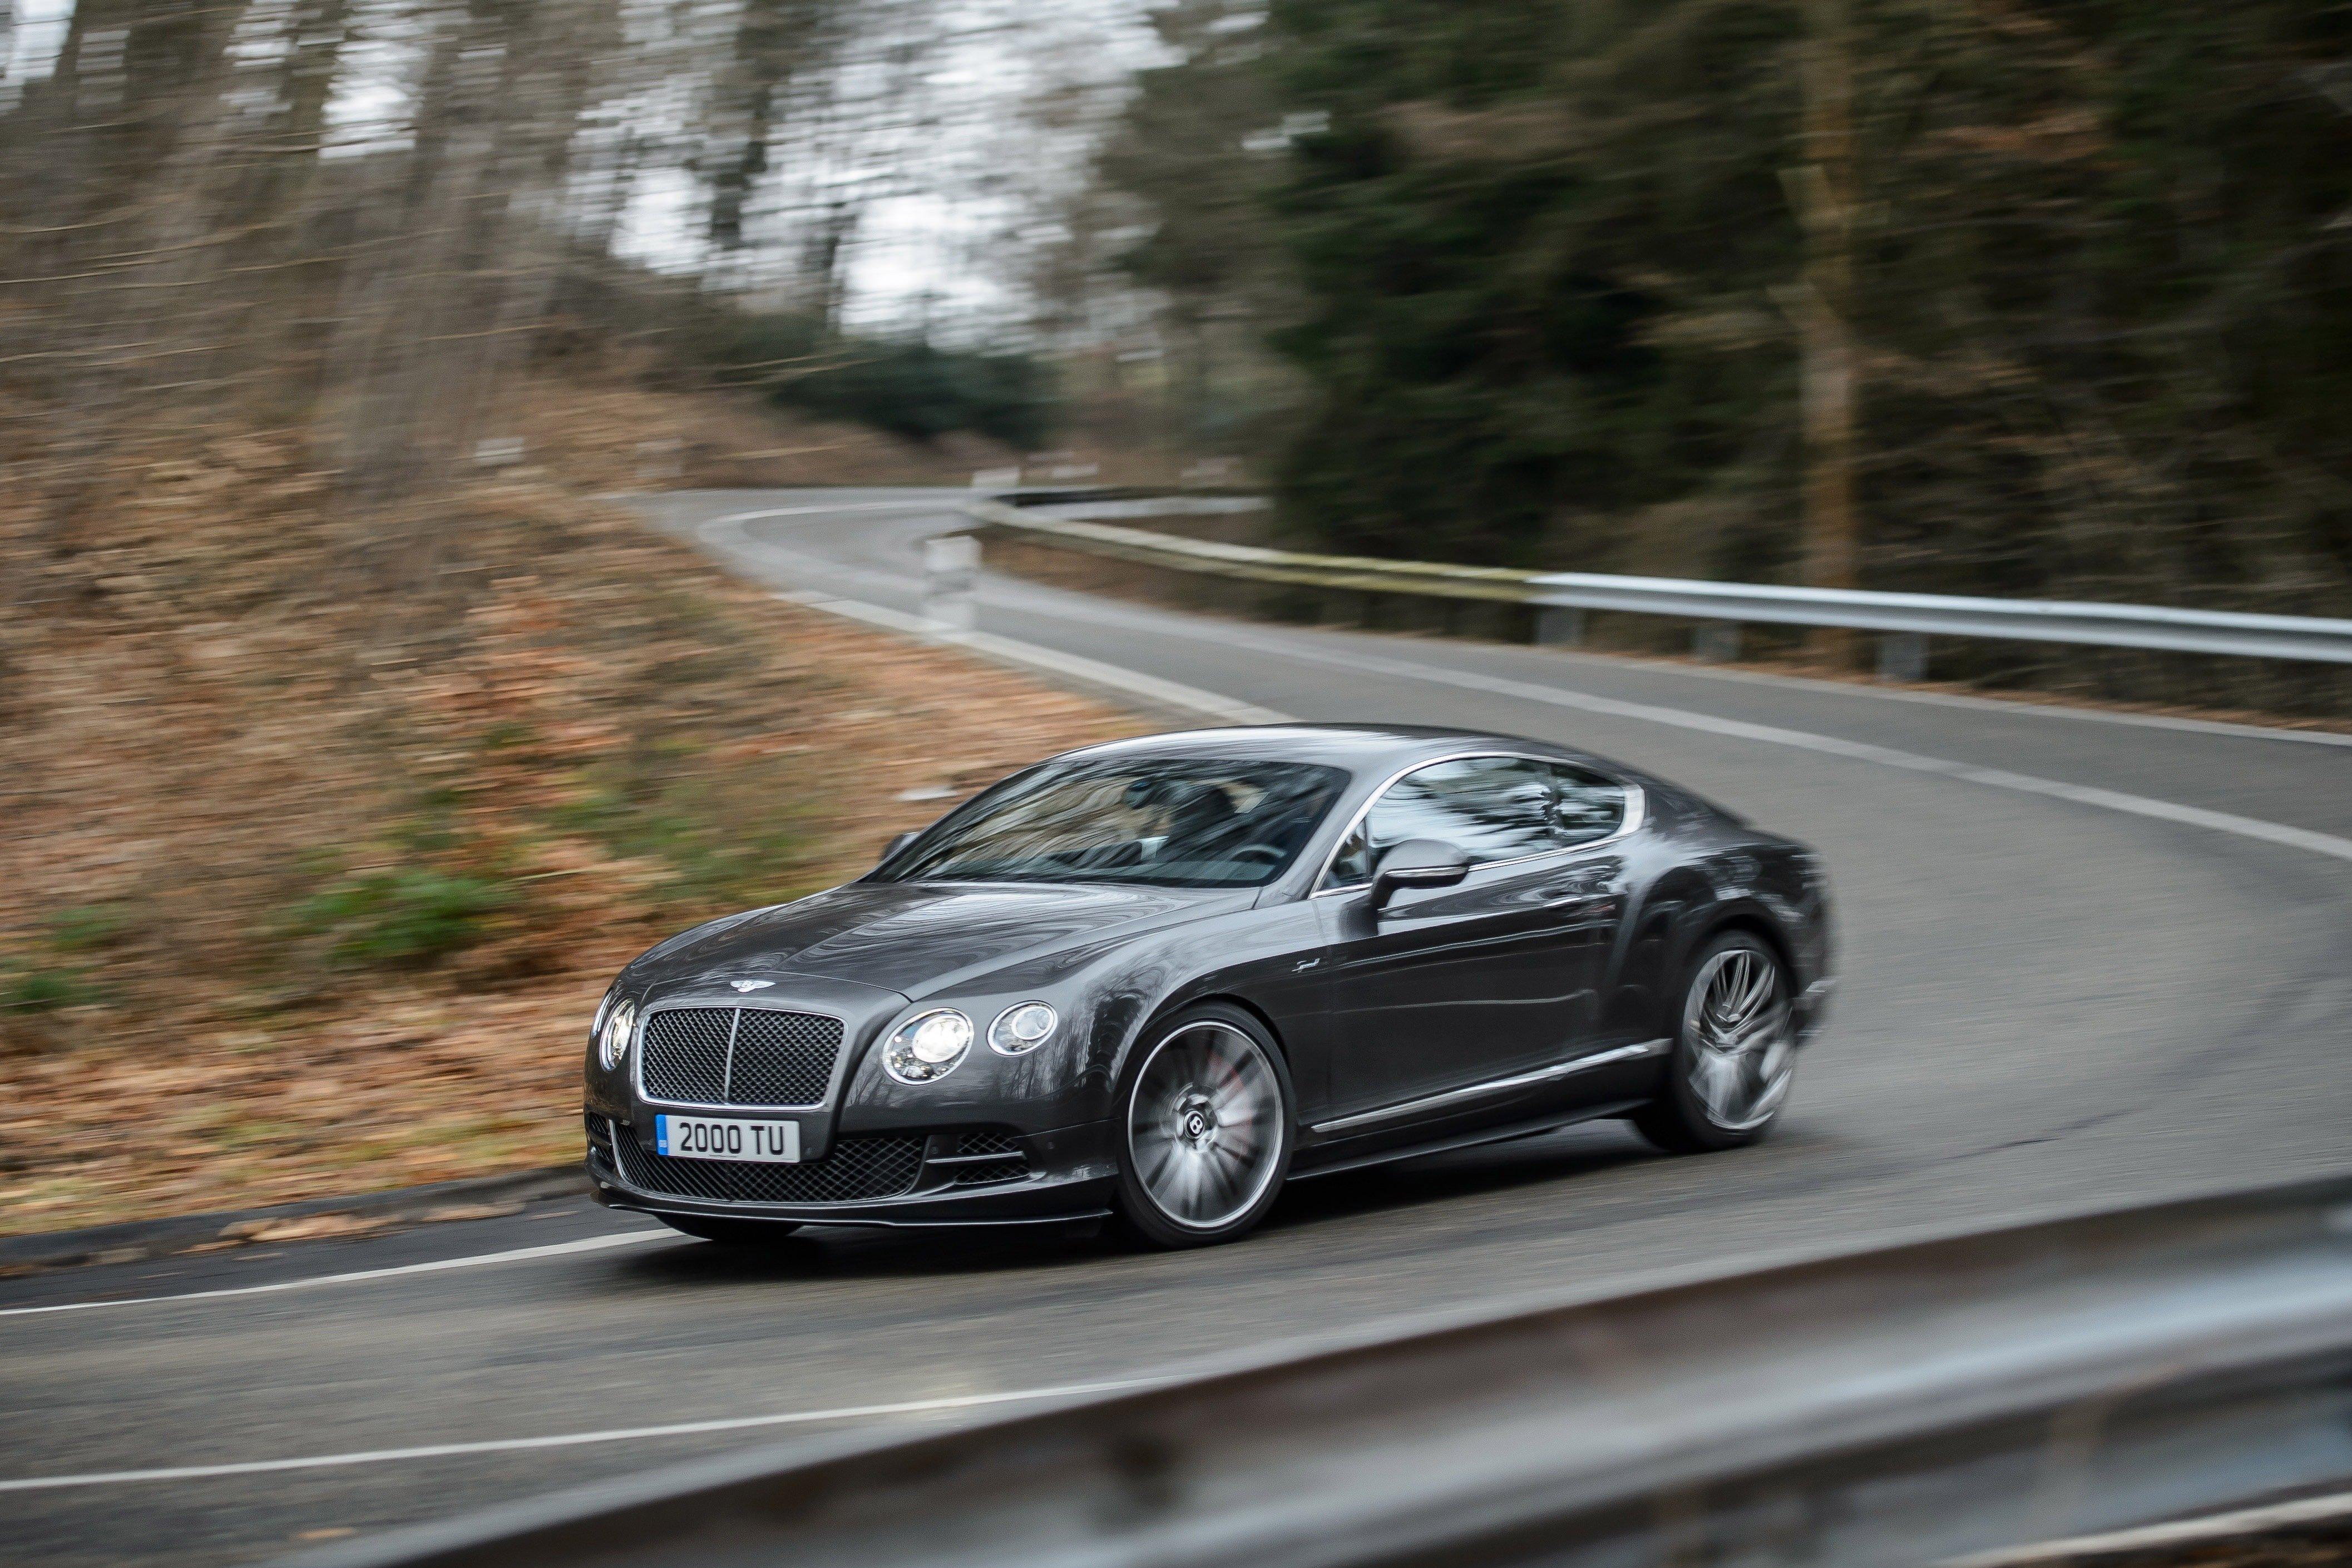 2014 Bentley Continental Gt Speed Even More Grunt Image